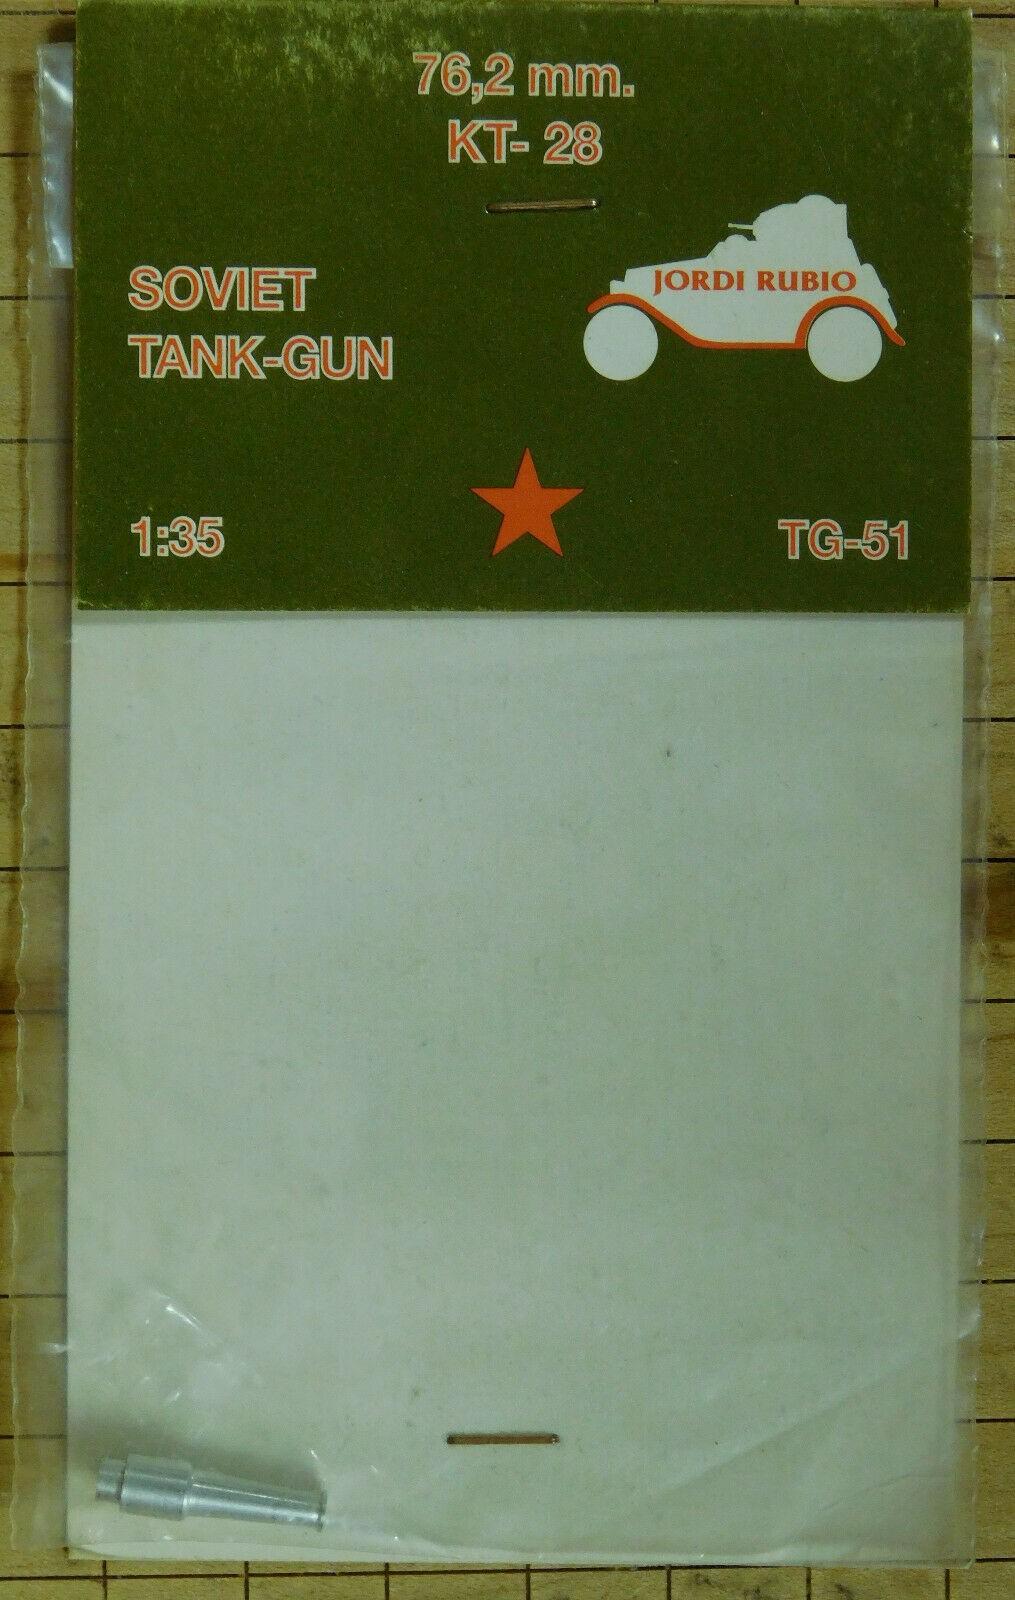 TG-51 76,2mm M27/32 Soviet Tank-Gun Image